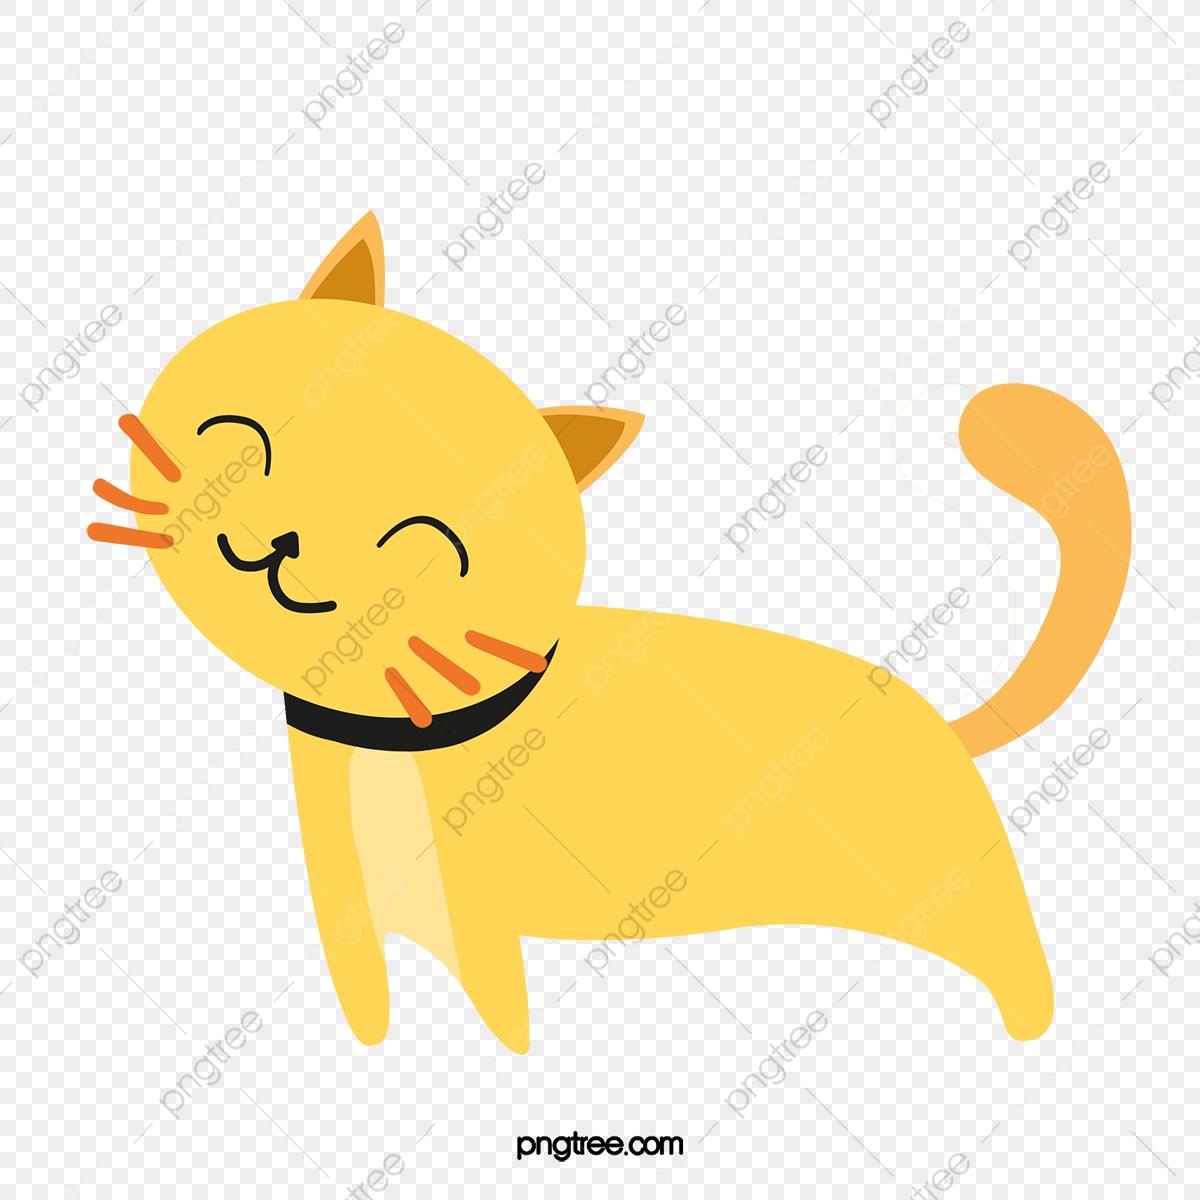 Lazy Cat, Cat Clipart, Yellow, Cartoon PNG Transparent Clipart Image.